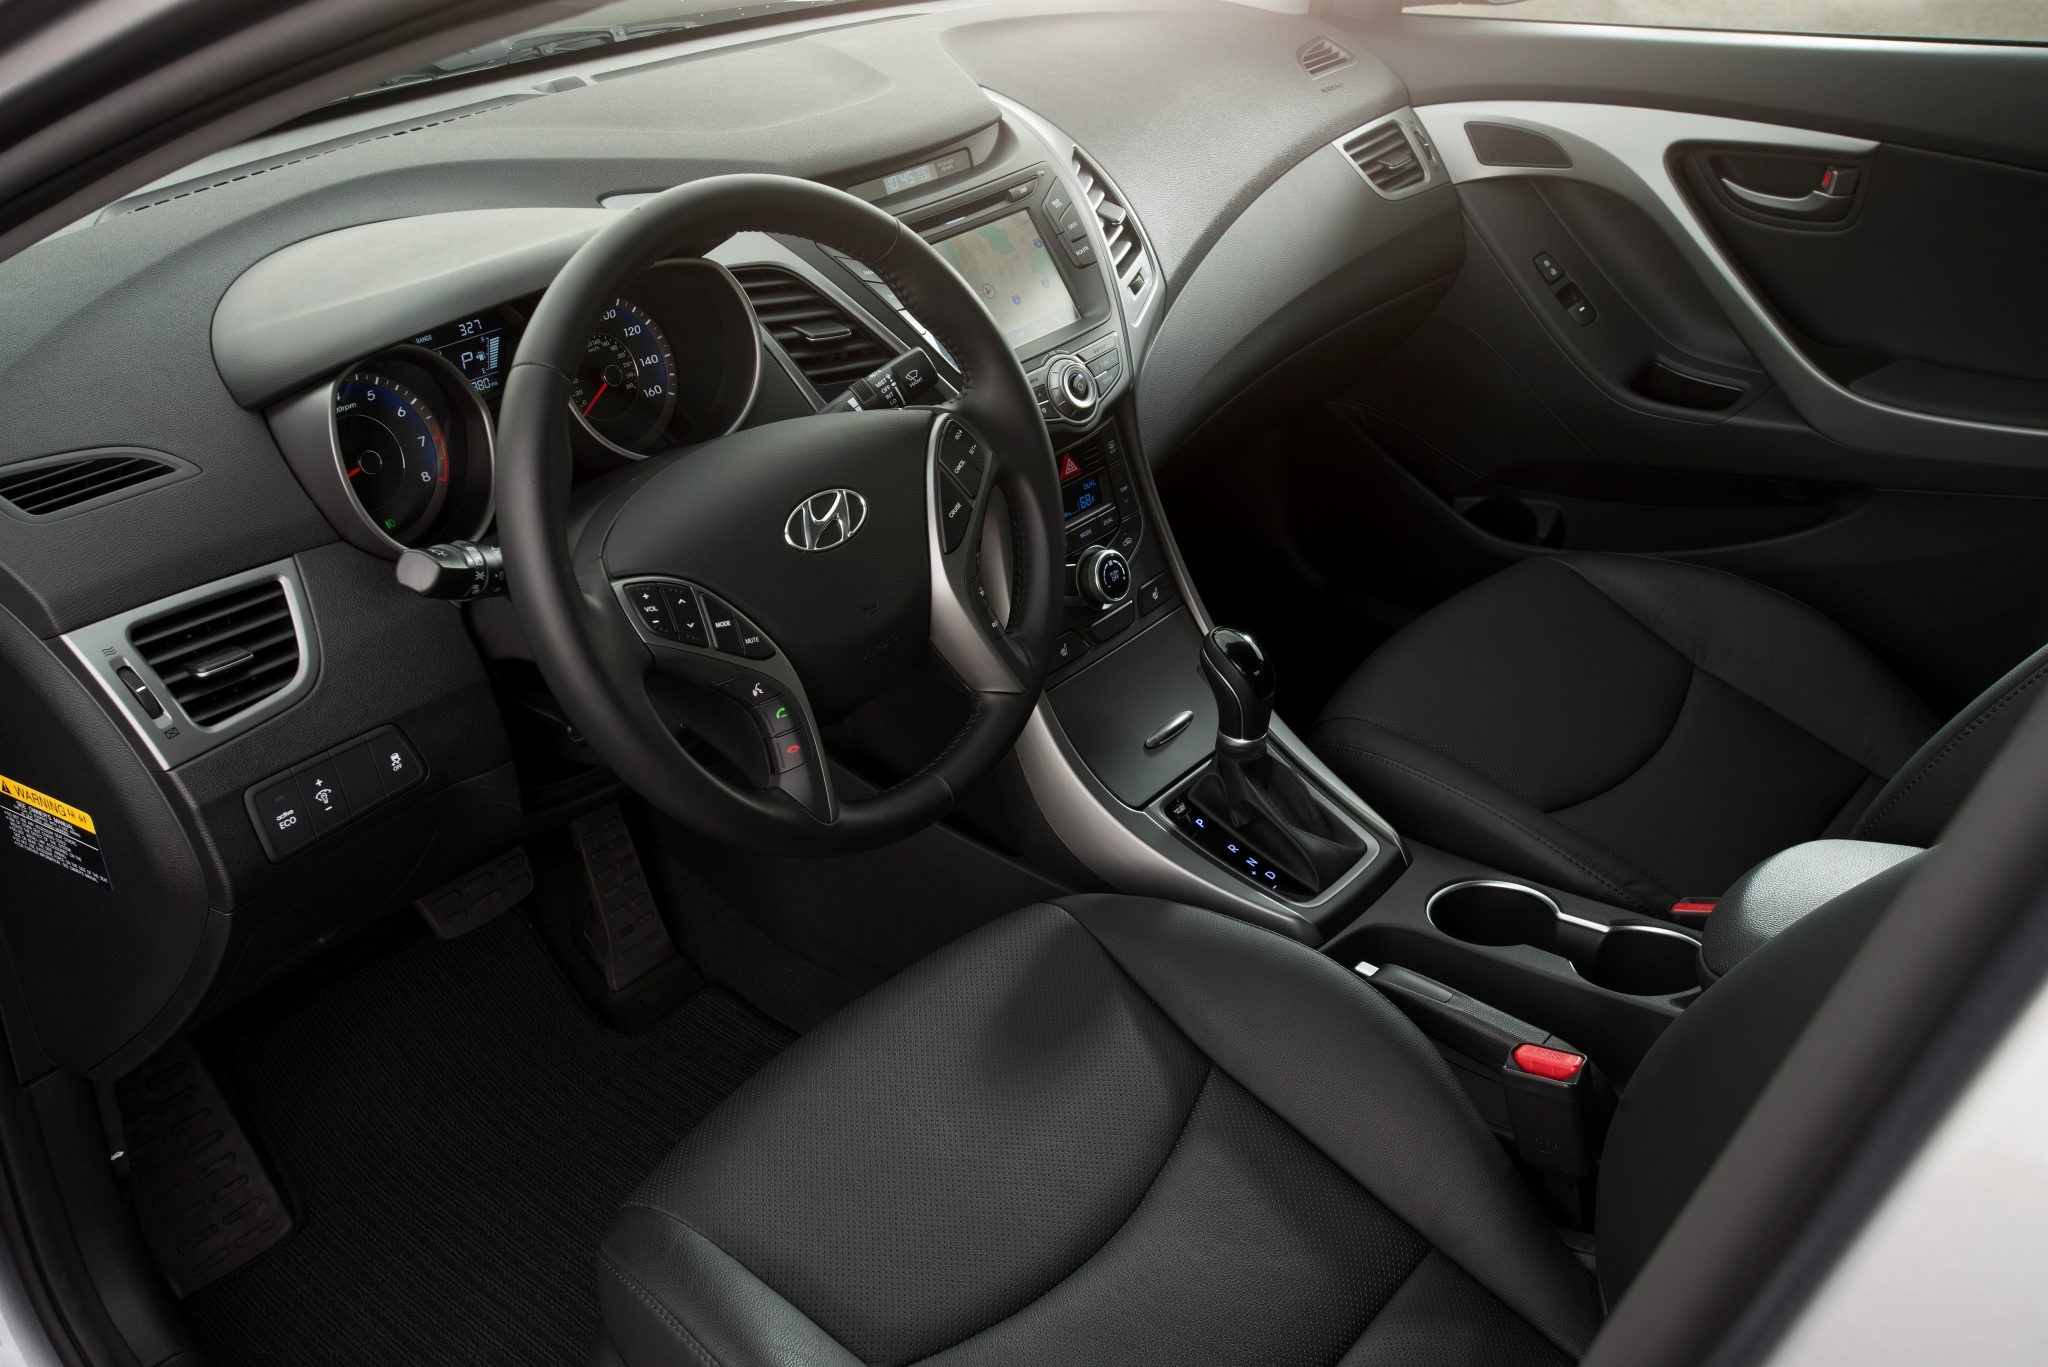 2015 Hyundai Elantra Updates